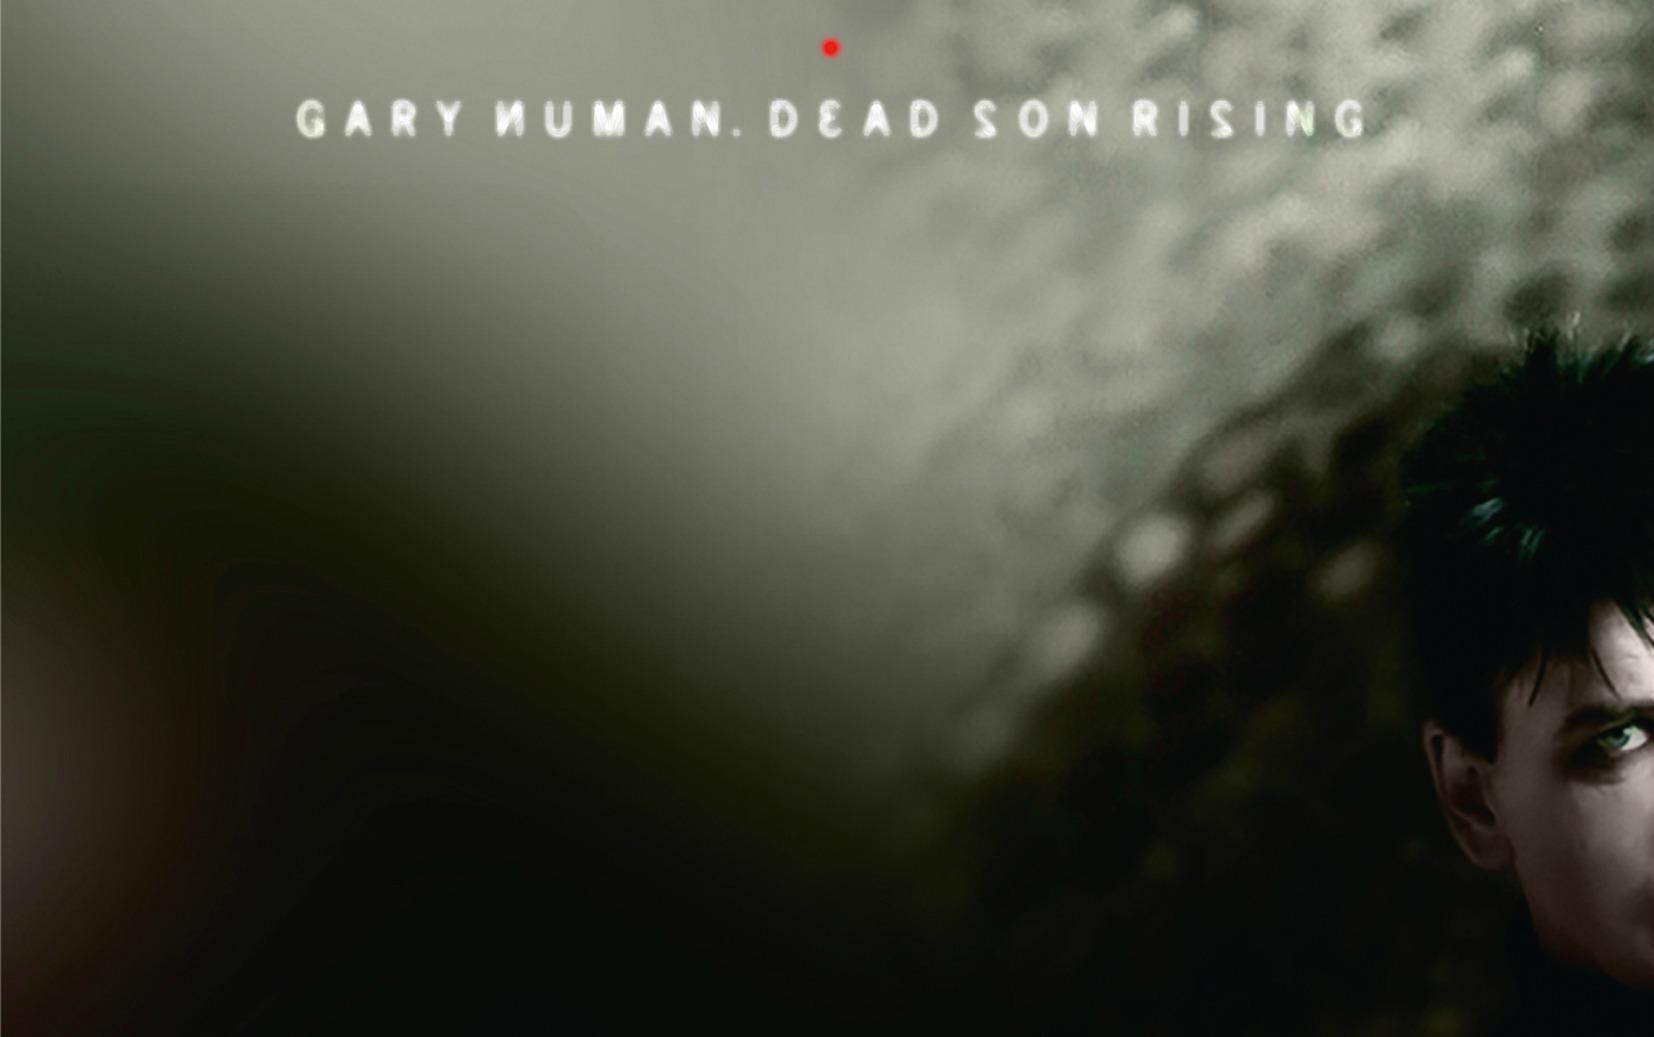 New releases: Gary Numan, '1991: Year Punk Broke,' Art of Noise, Blondie, Human League